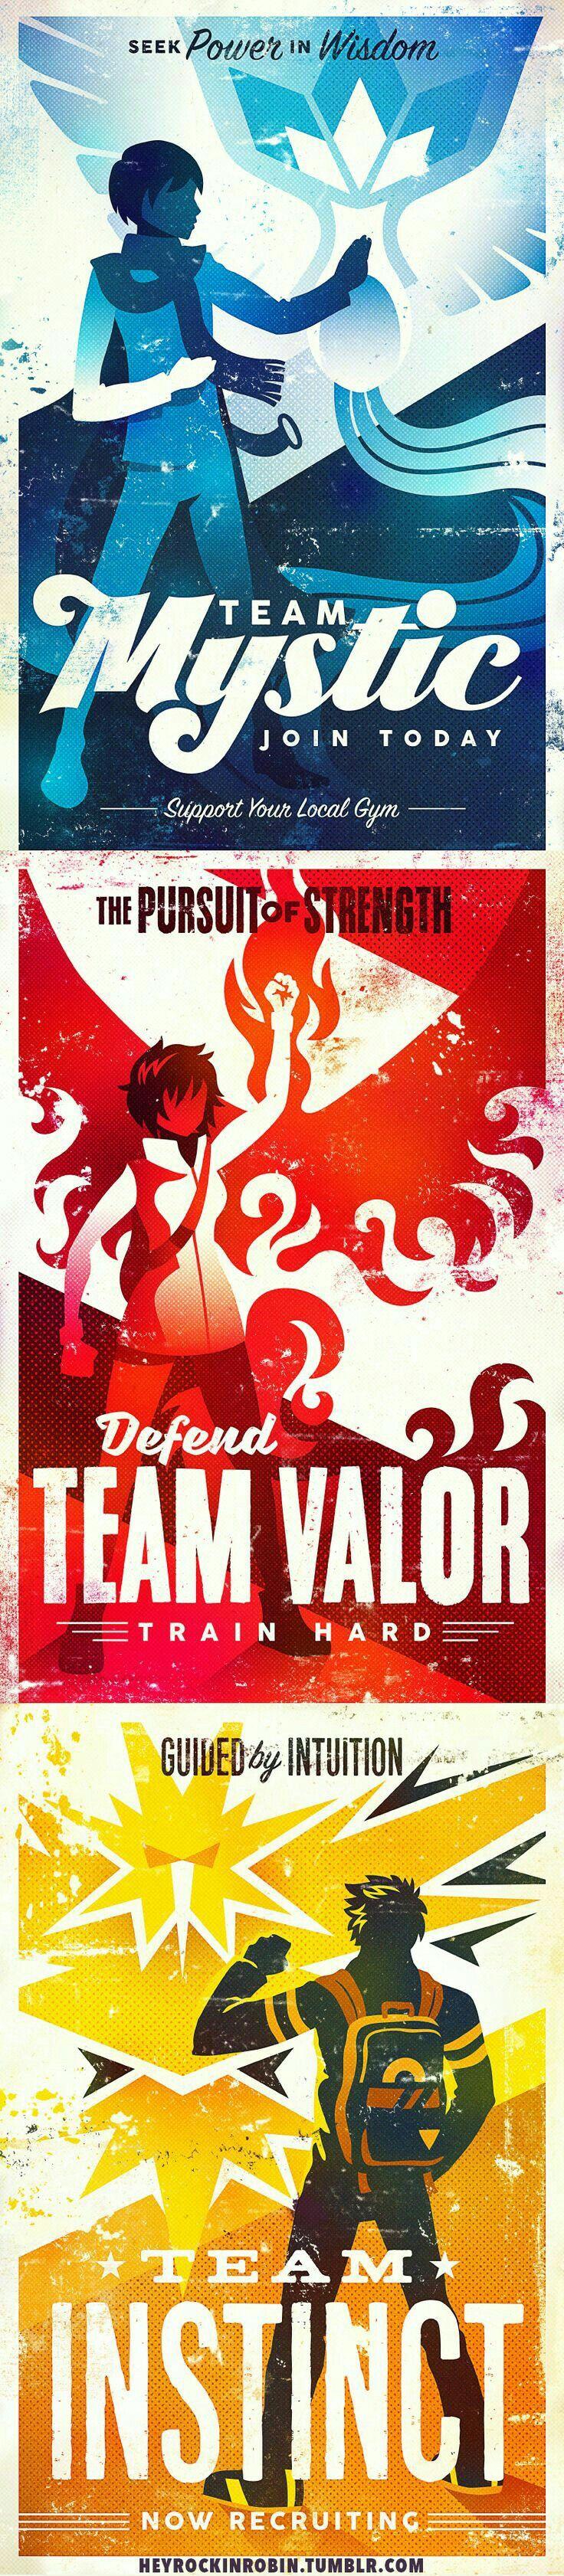 Team Mystic, Team Valor, Team Instinct, text, Articuno, Moltres, Zapdos, Pokémon Go, Trainers; Pokémon